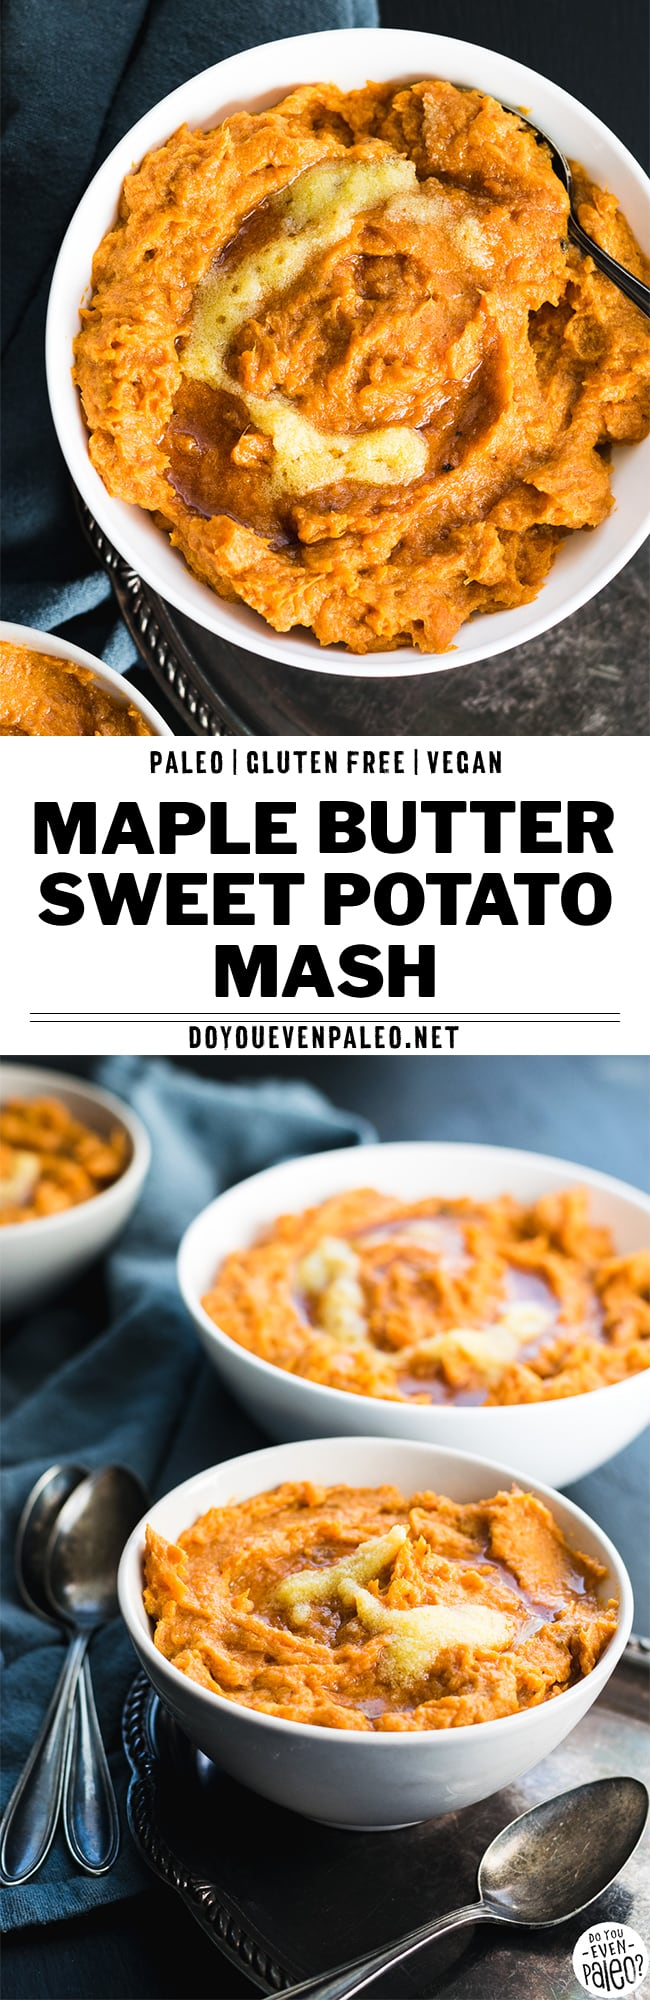 Paleo Maple Butter Sweet Potato Mash Recipe | DoYouEvenPaleo.net